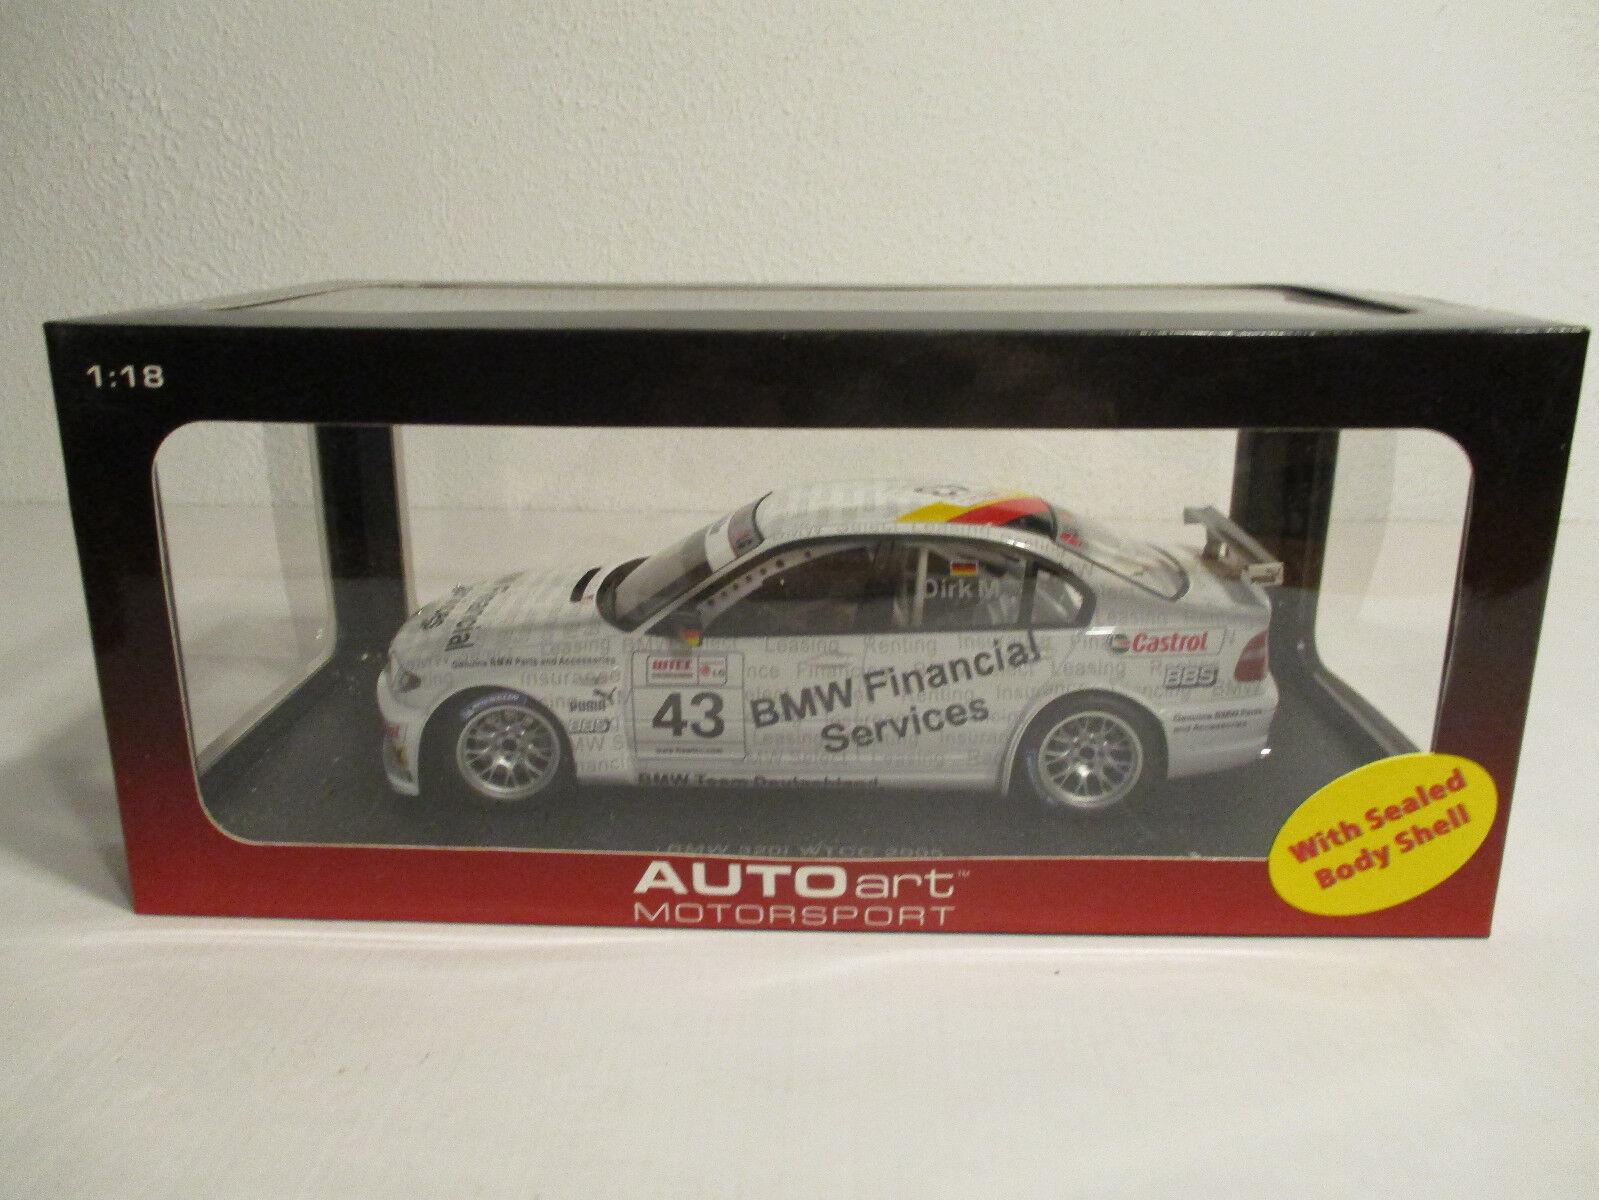 (Gok) 1 18 Autoart bmw 320i WTCC 2005 D. Müller nuevo embalaje original